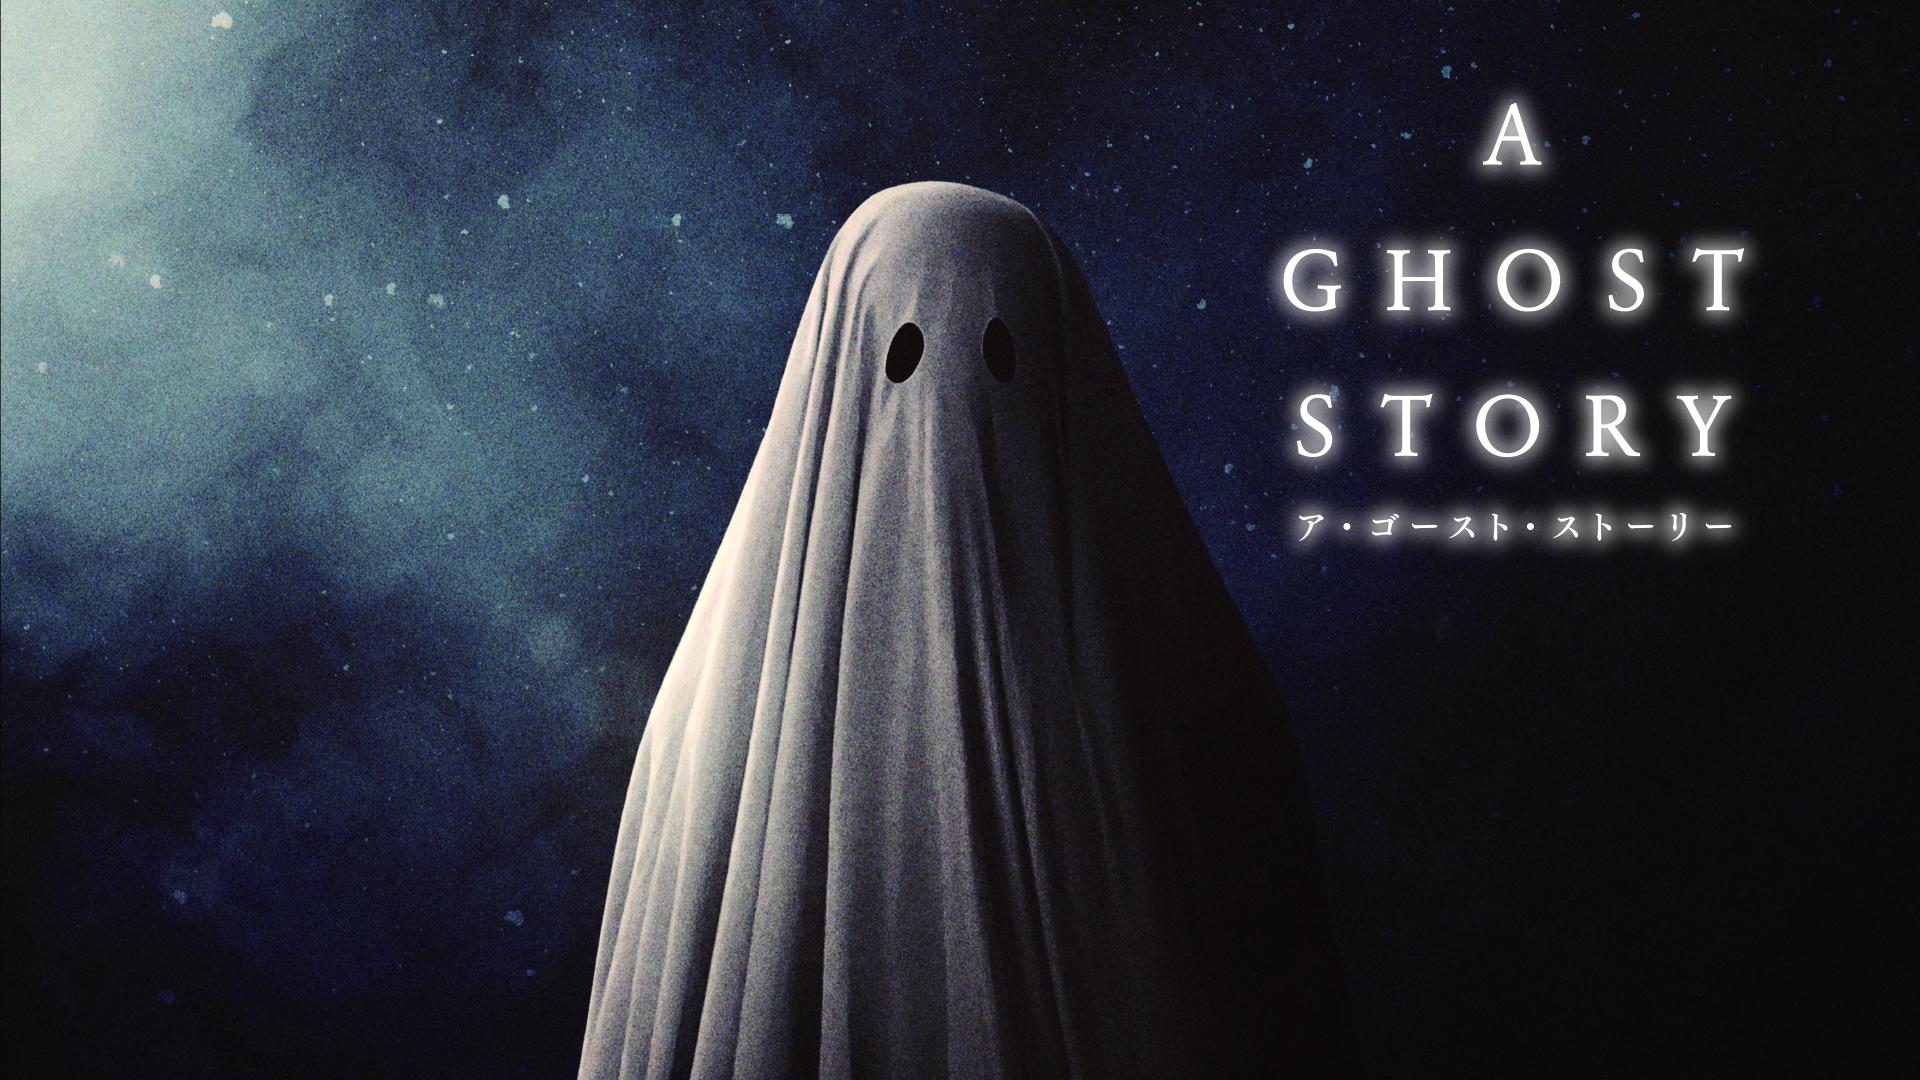 A GHOST STORY / ア・ゴースト・ストーリー(字幕版)